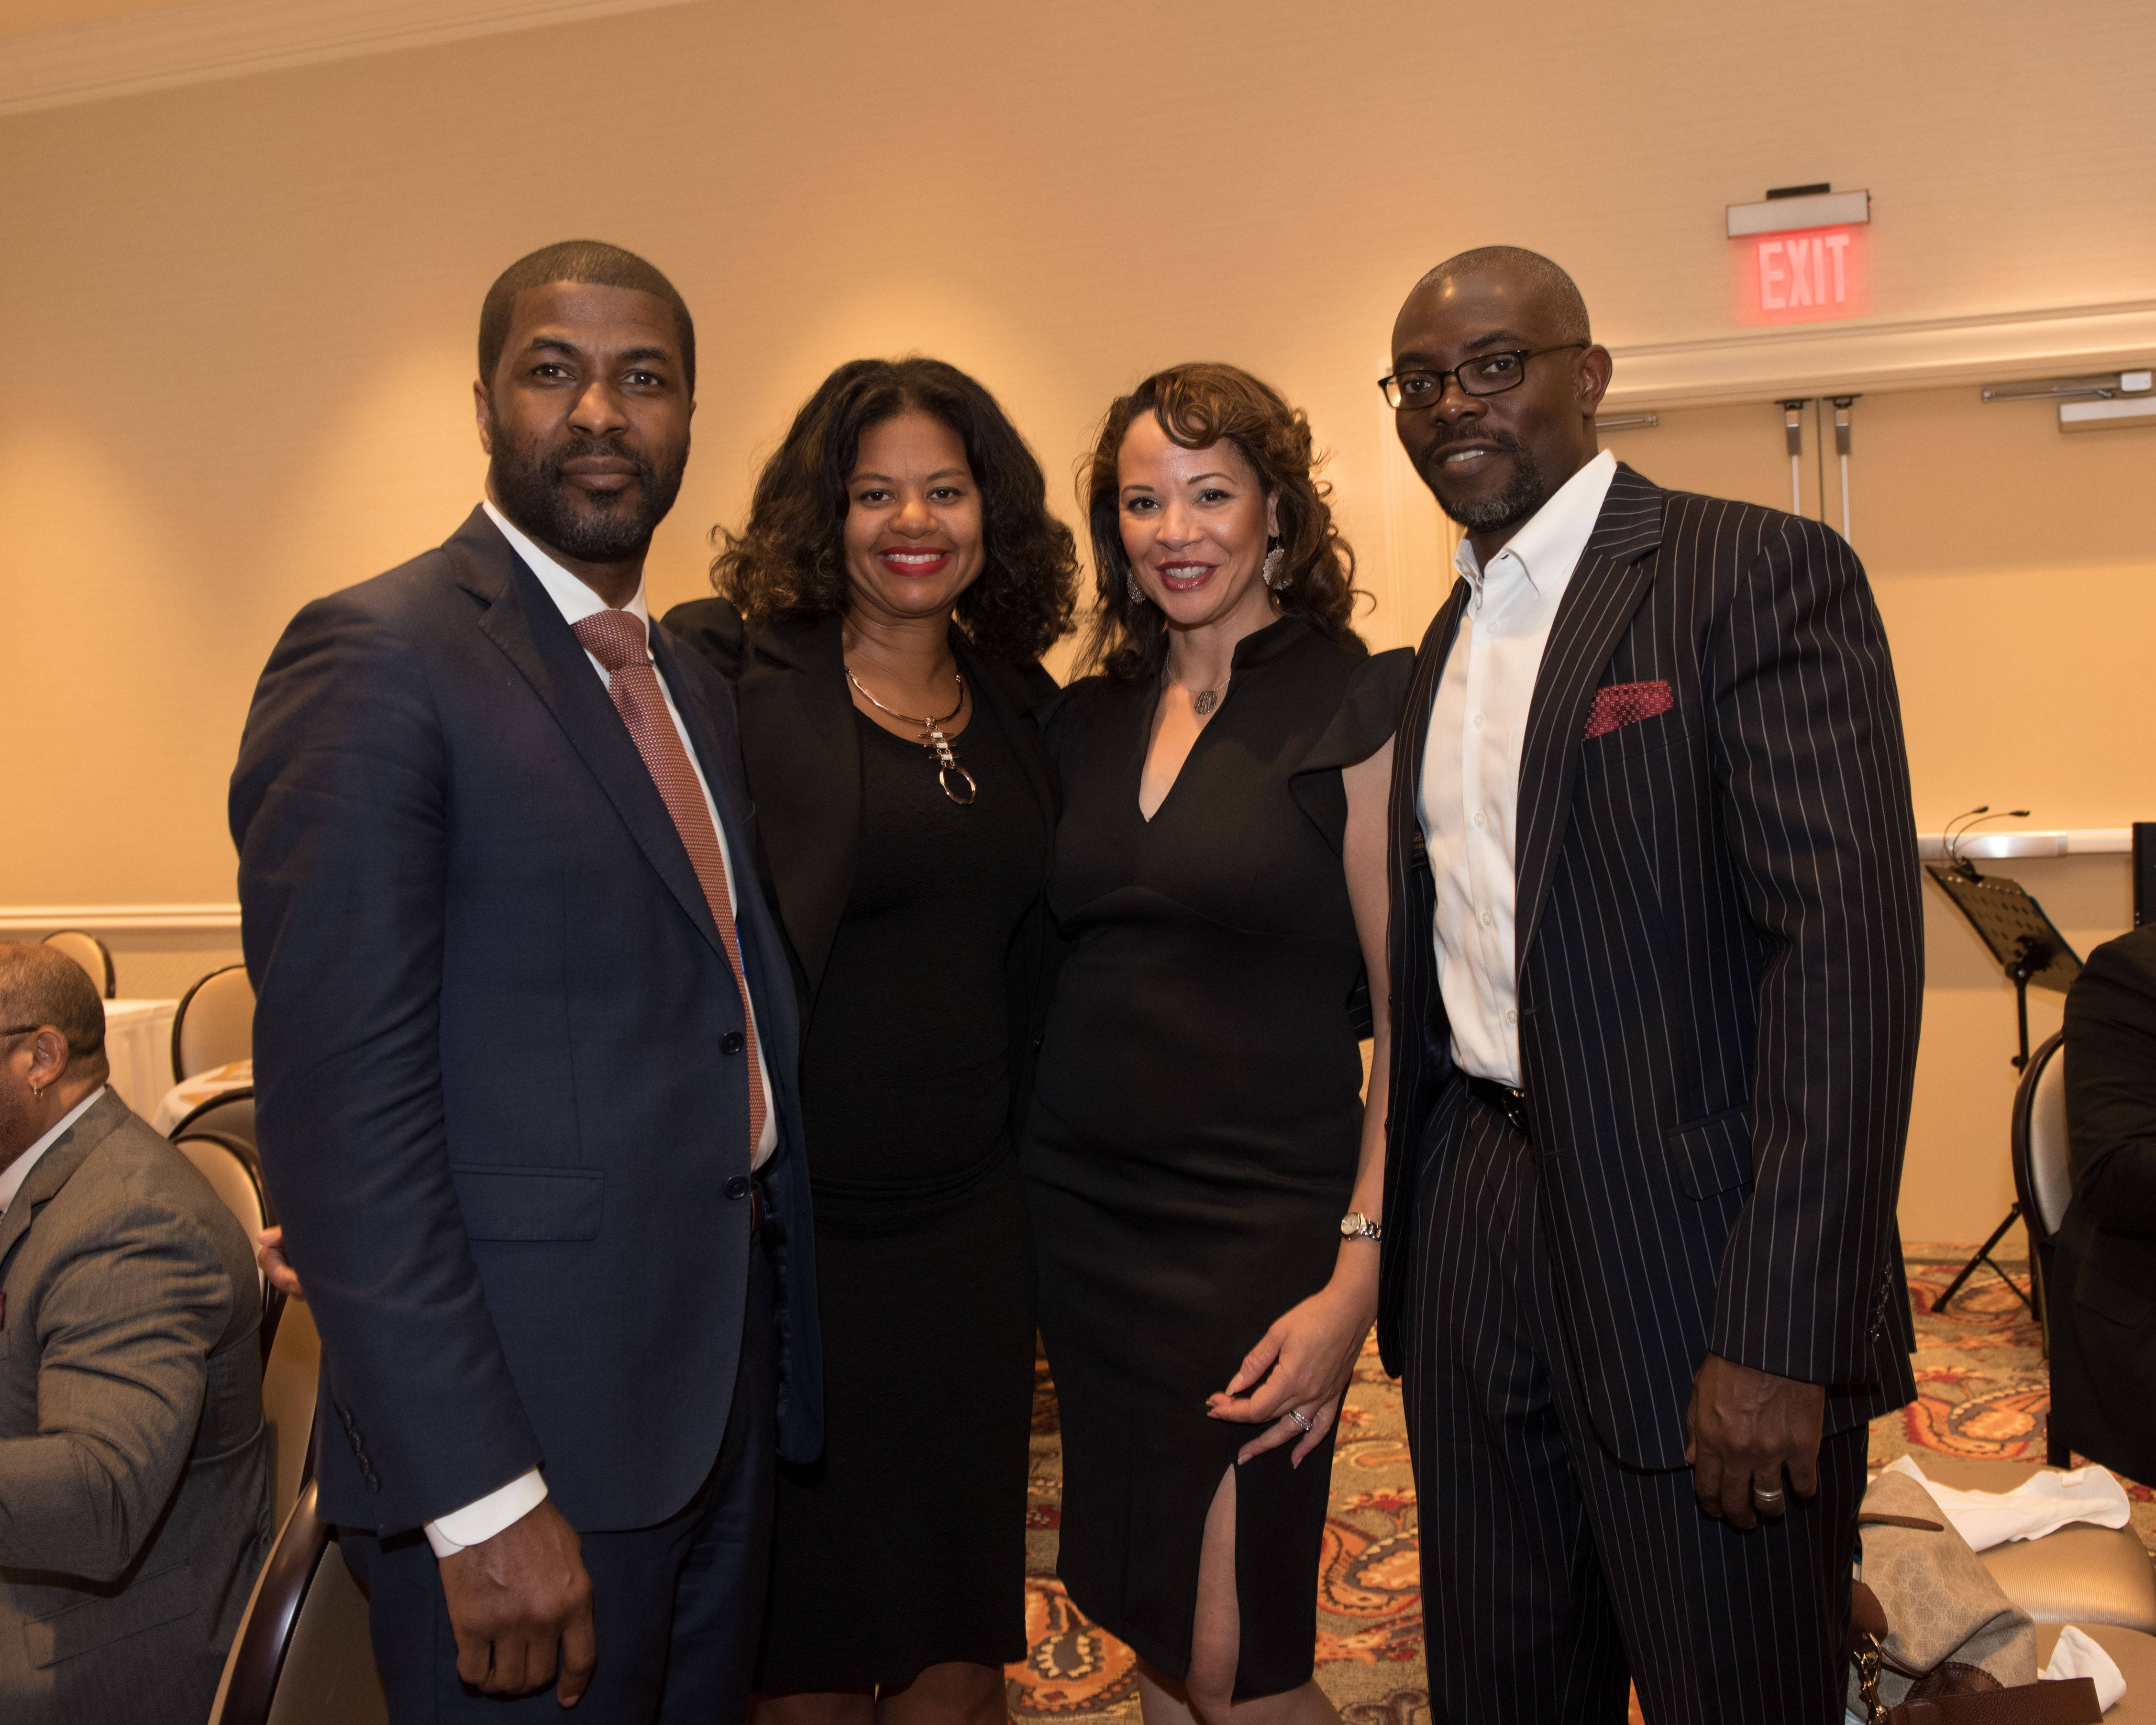 Simba Sana, Natalie Hopkinson, and co-hosts Nancy Brown and Lorenzo McRae